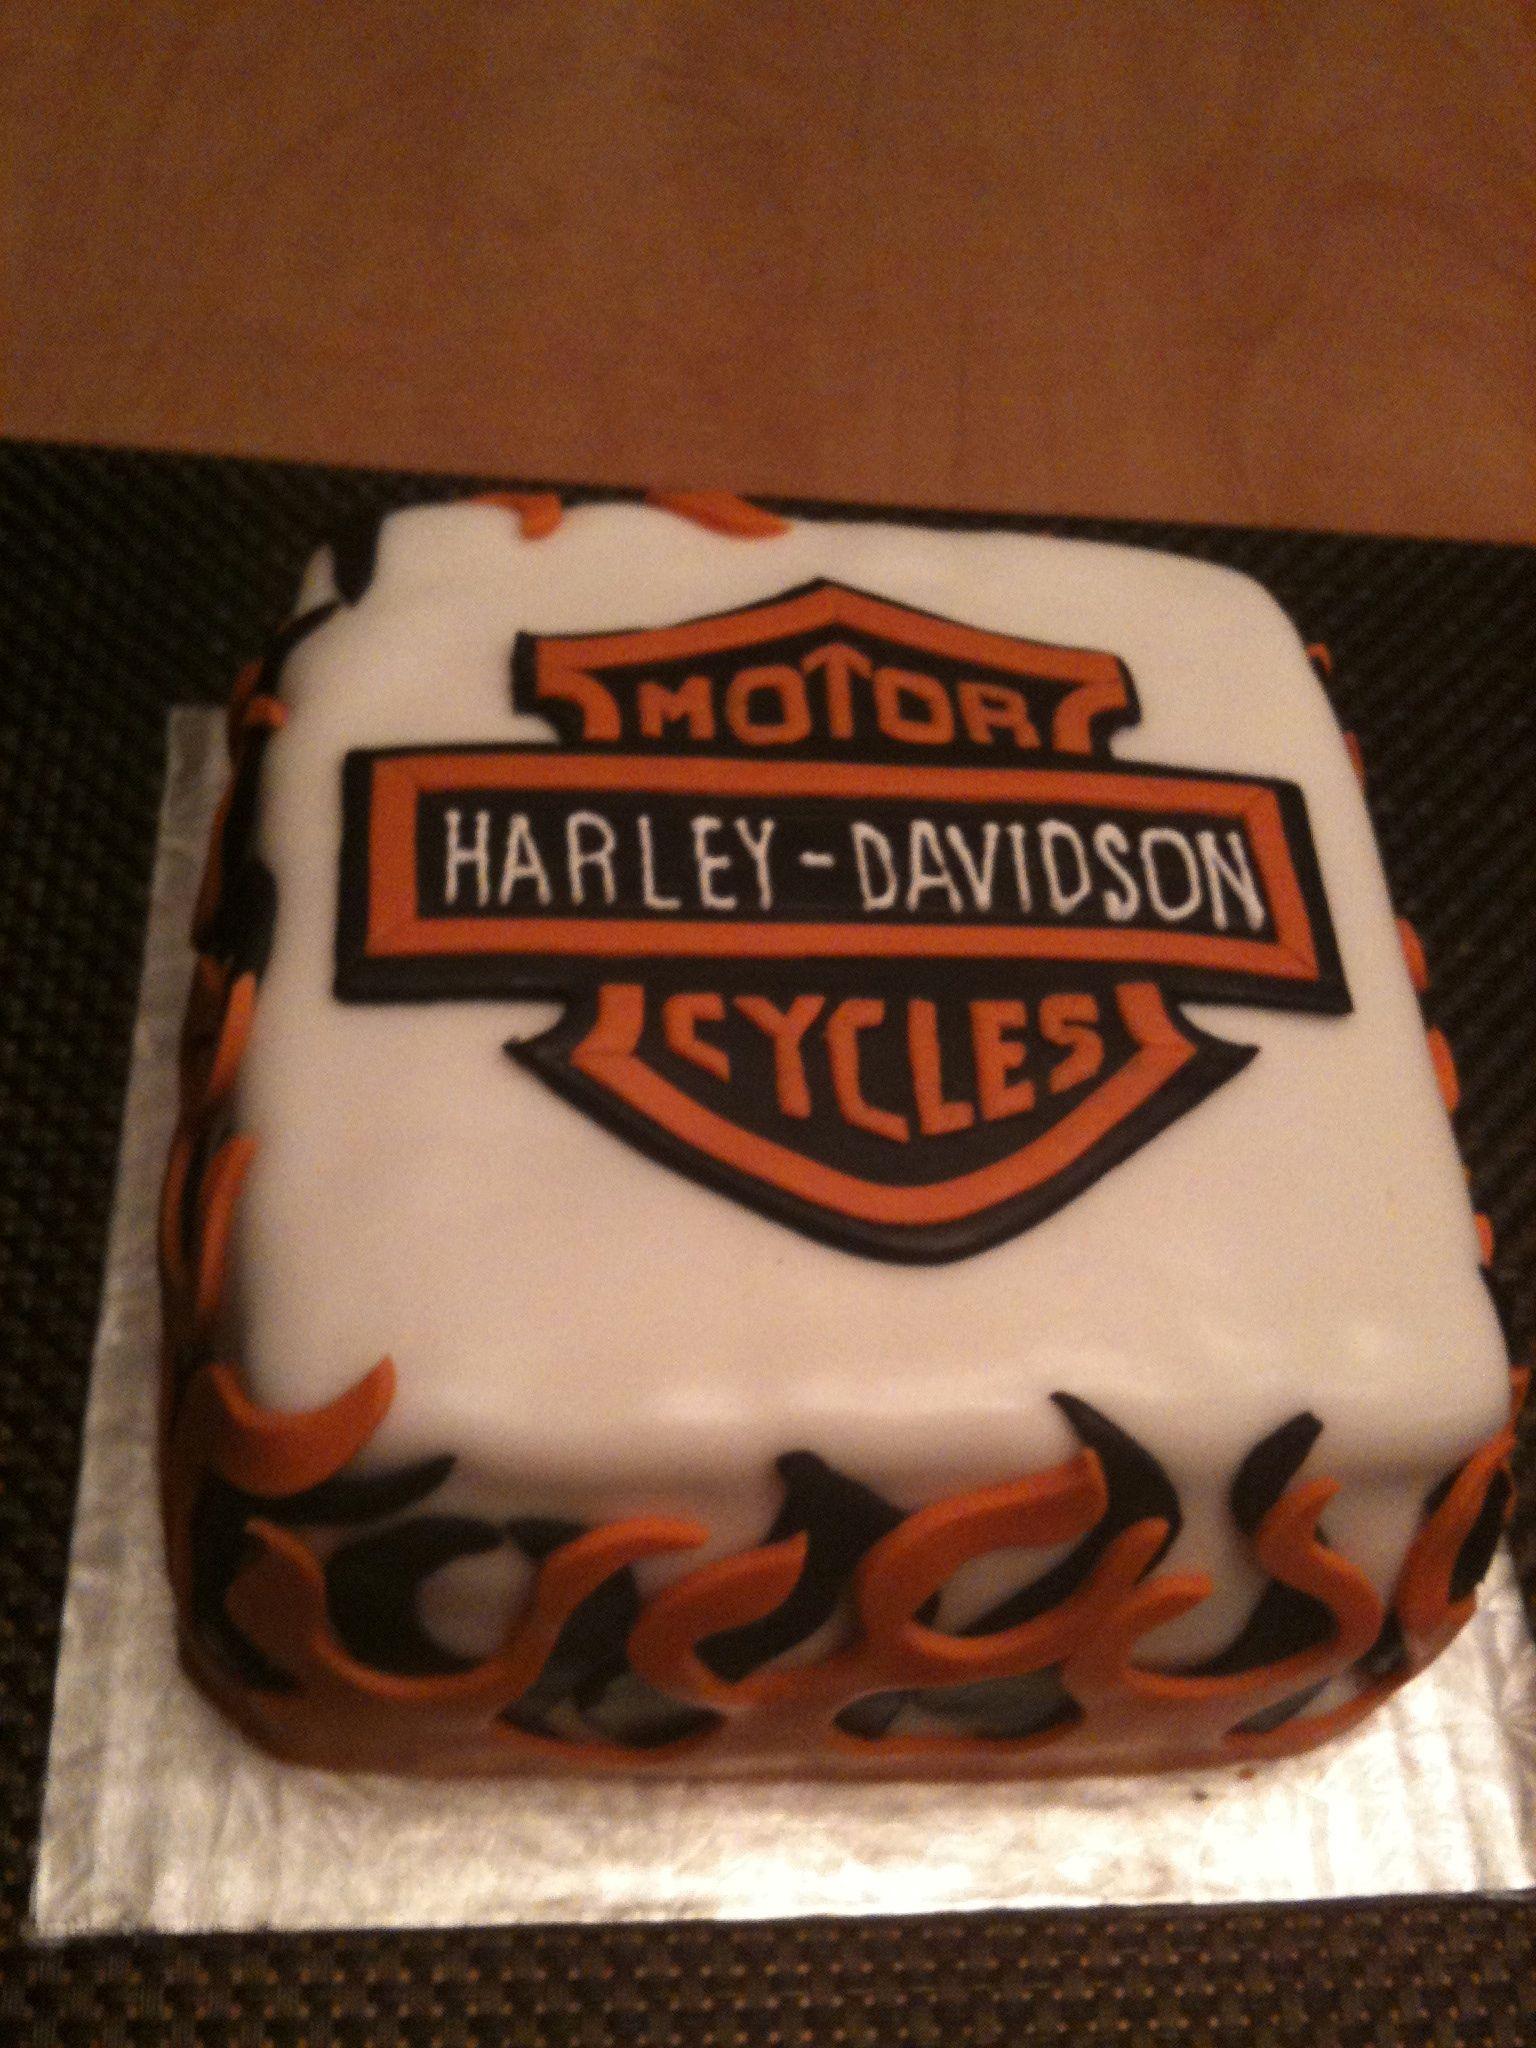 Harley Davidson Cake Ideas Retirement 71139 Harley Davidso